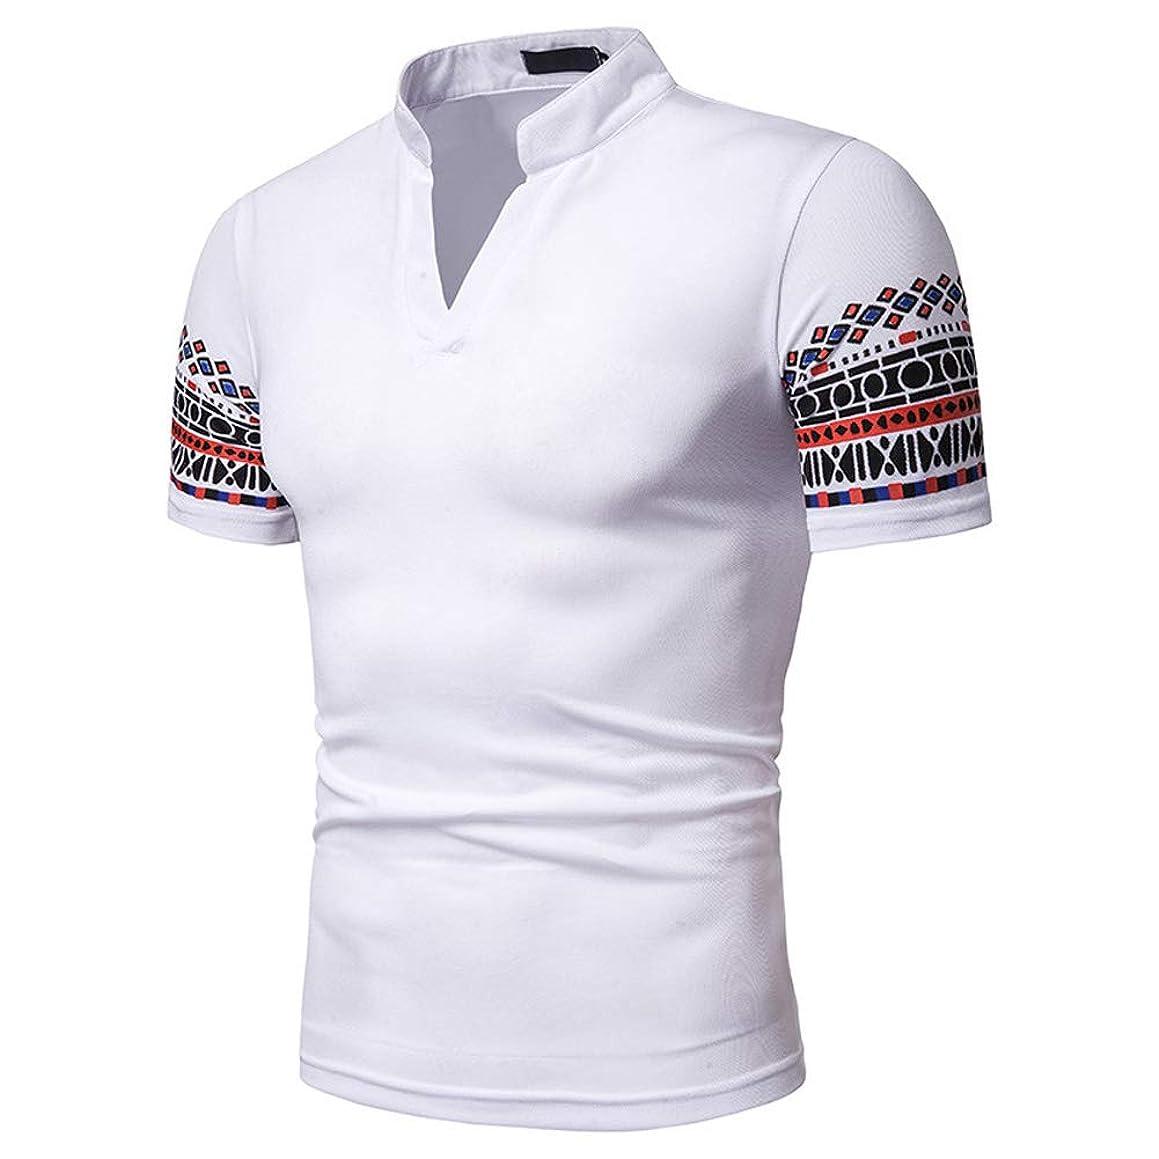 Romantiko Mens Casual V-Neck Henley Short Sleeve Cotton Pique Polo Slim Fit Print T-Shirts